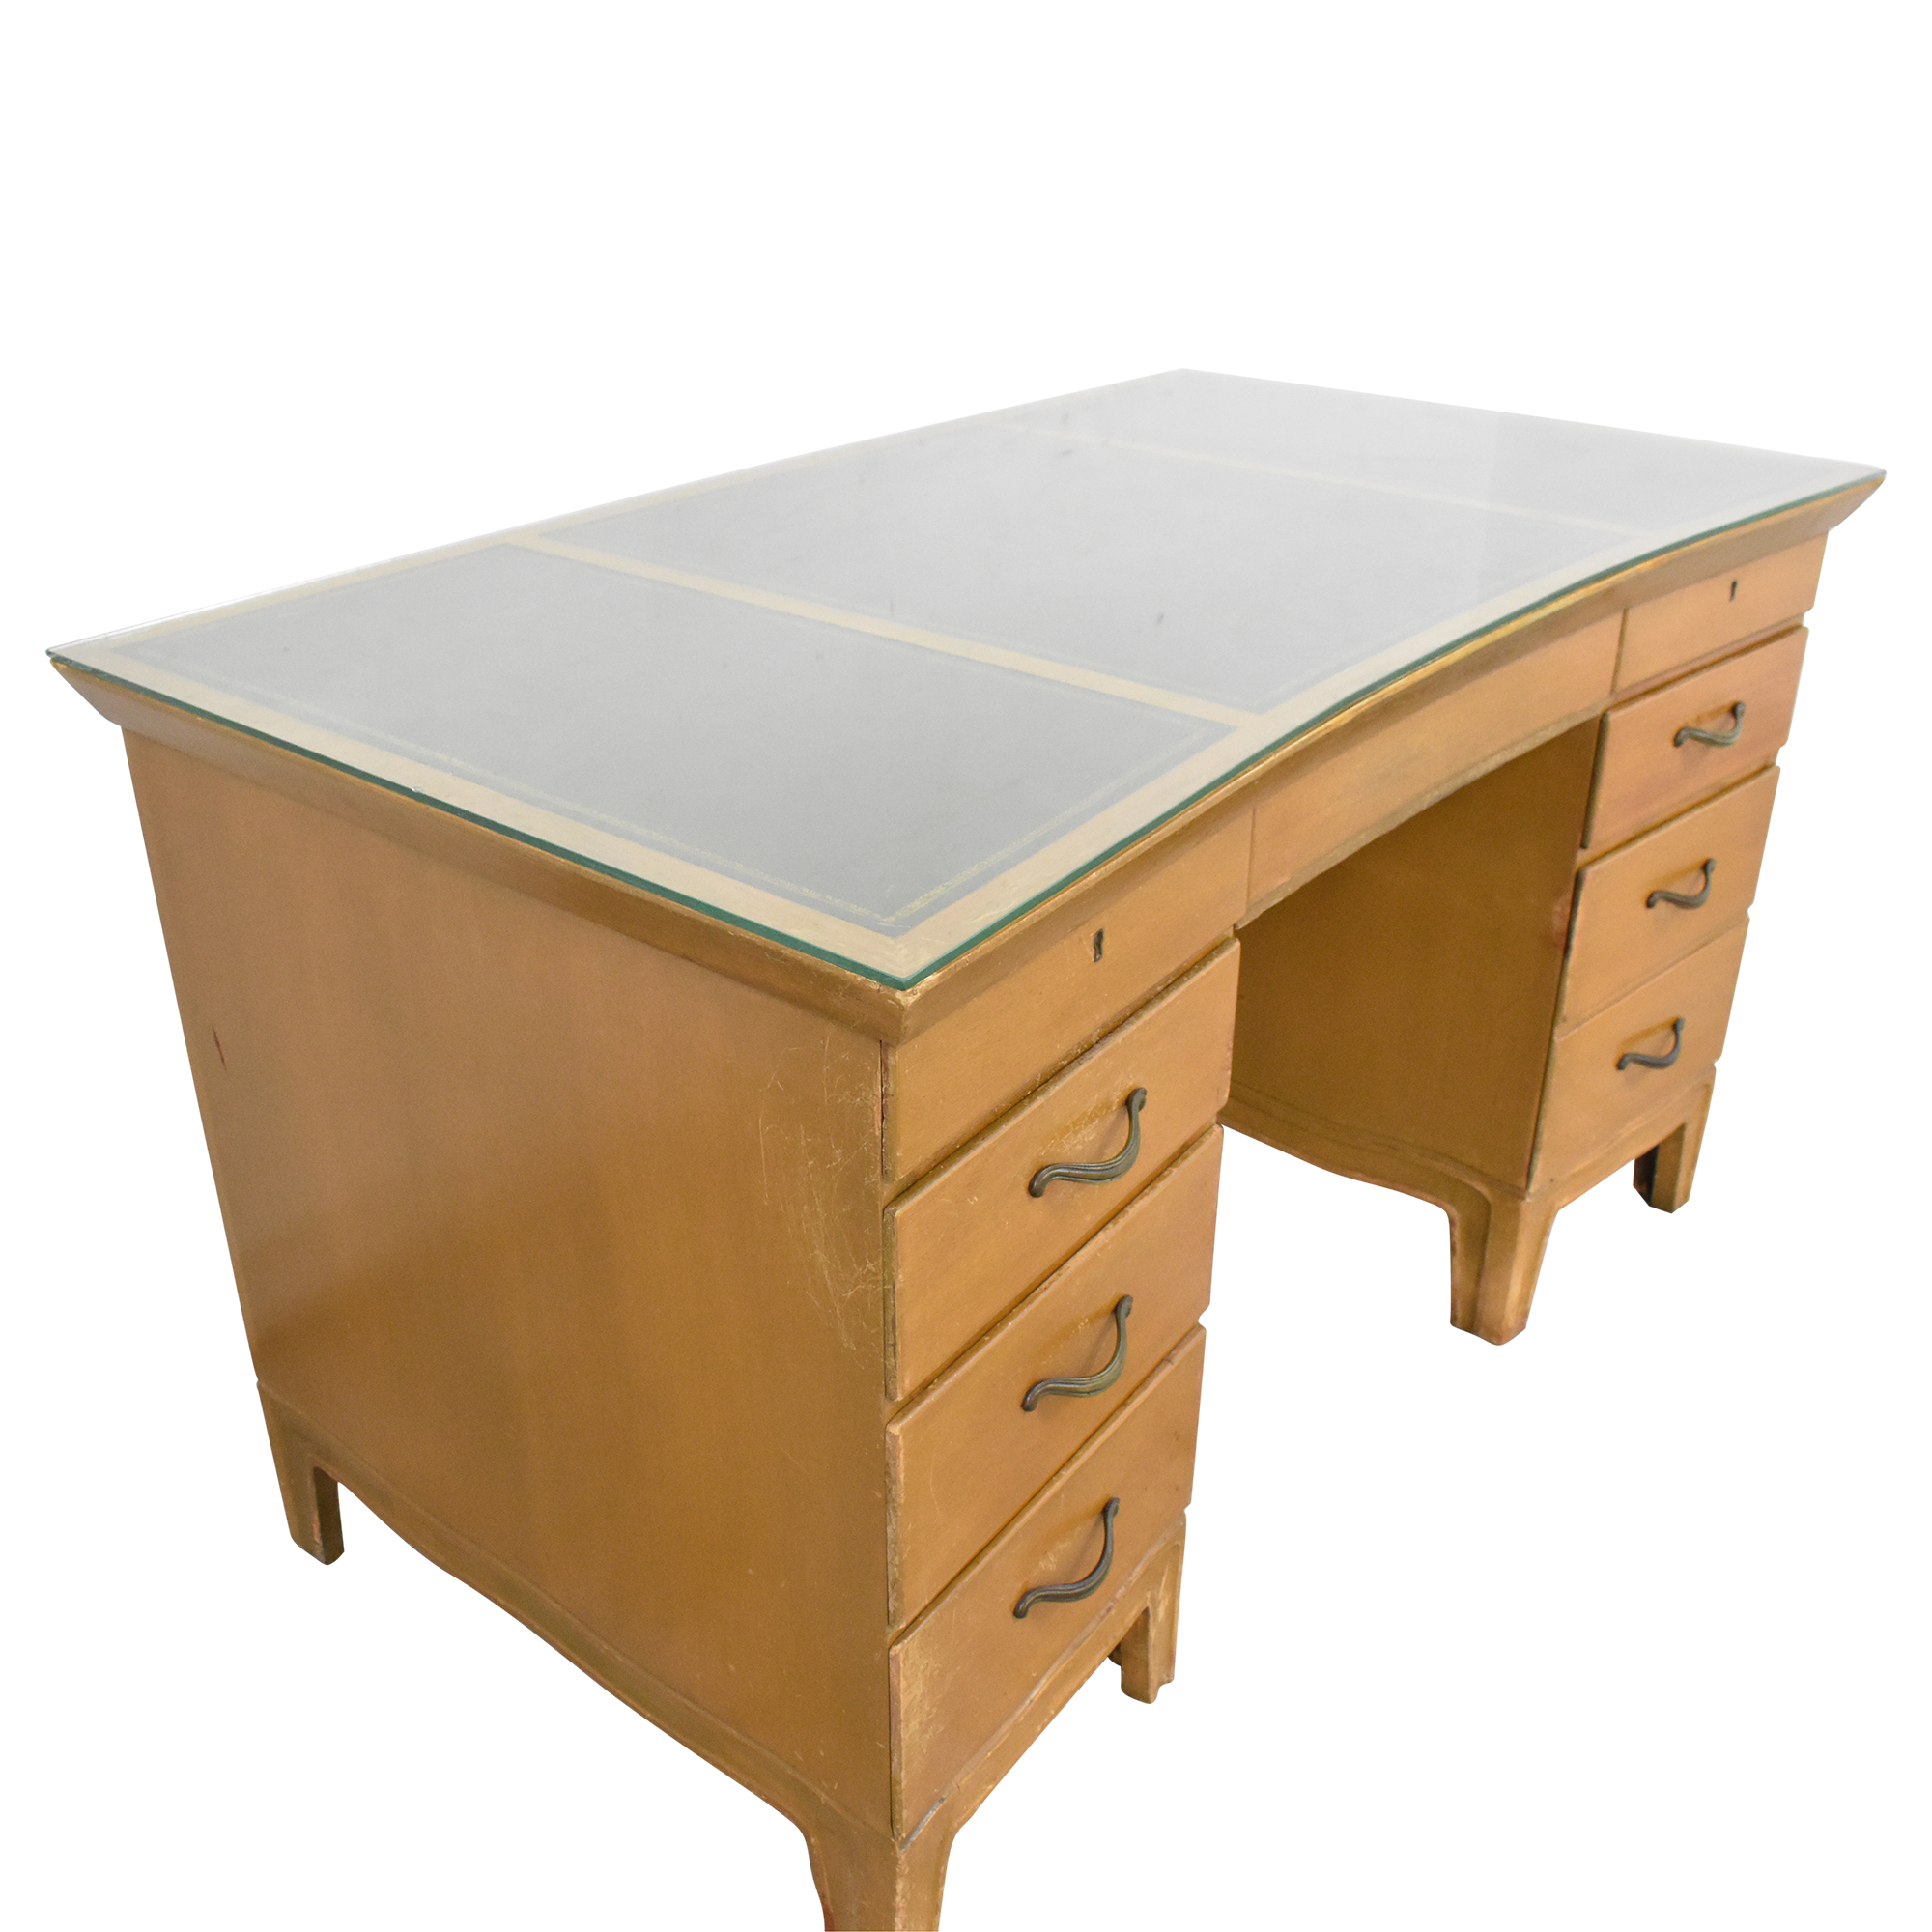 Tomlinson Tomlinson Vintage Double Pedestal Desk price